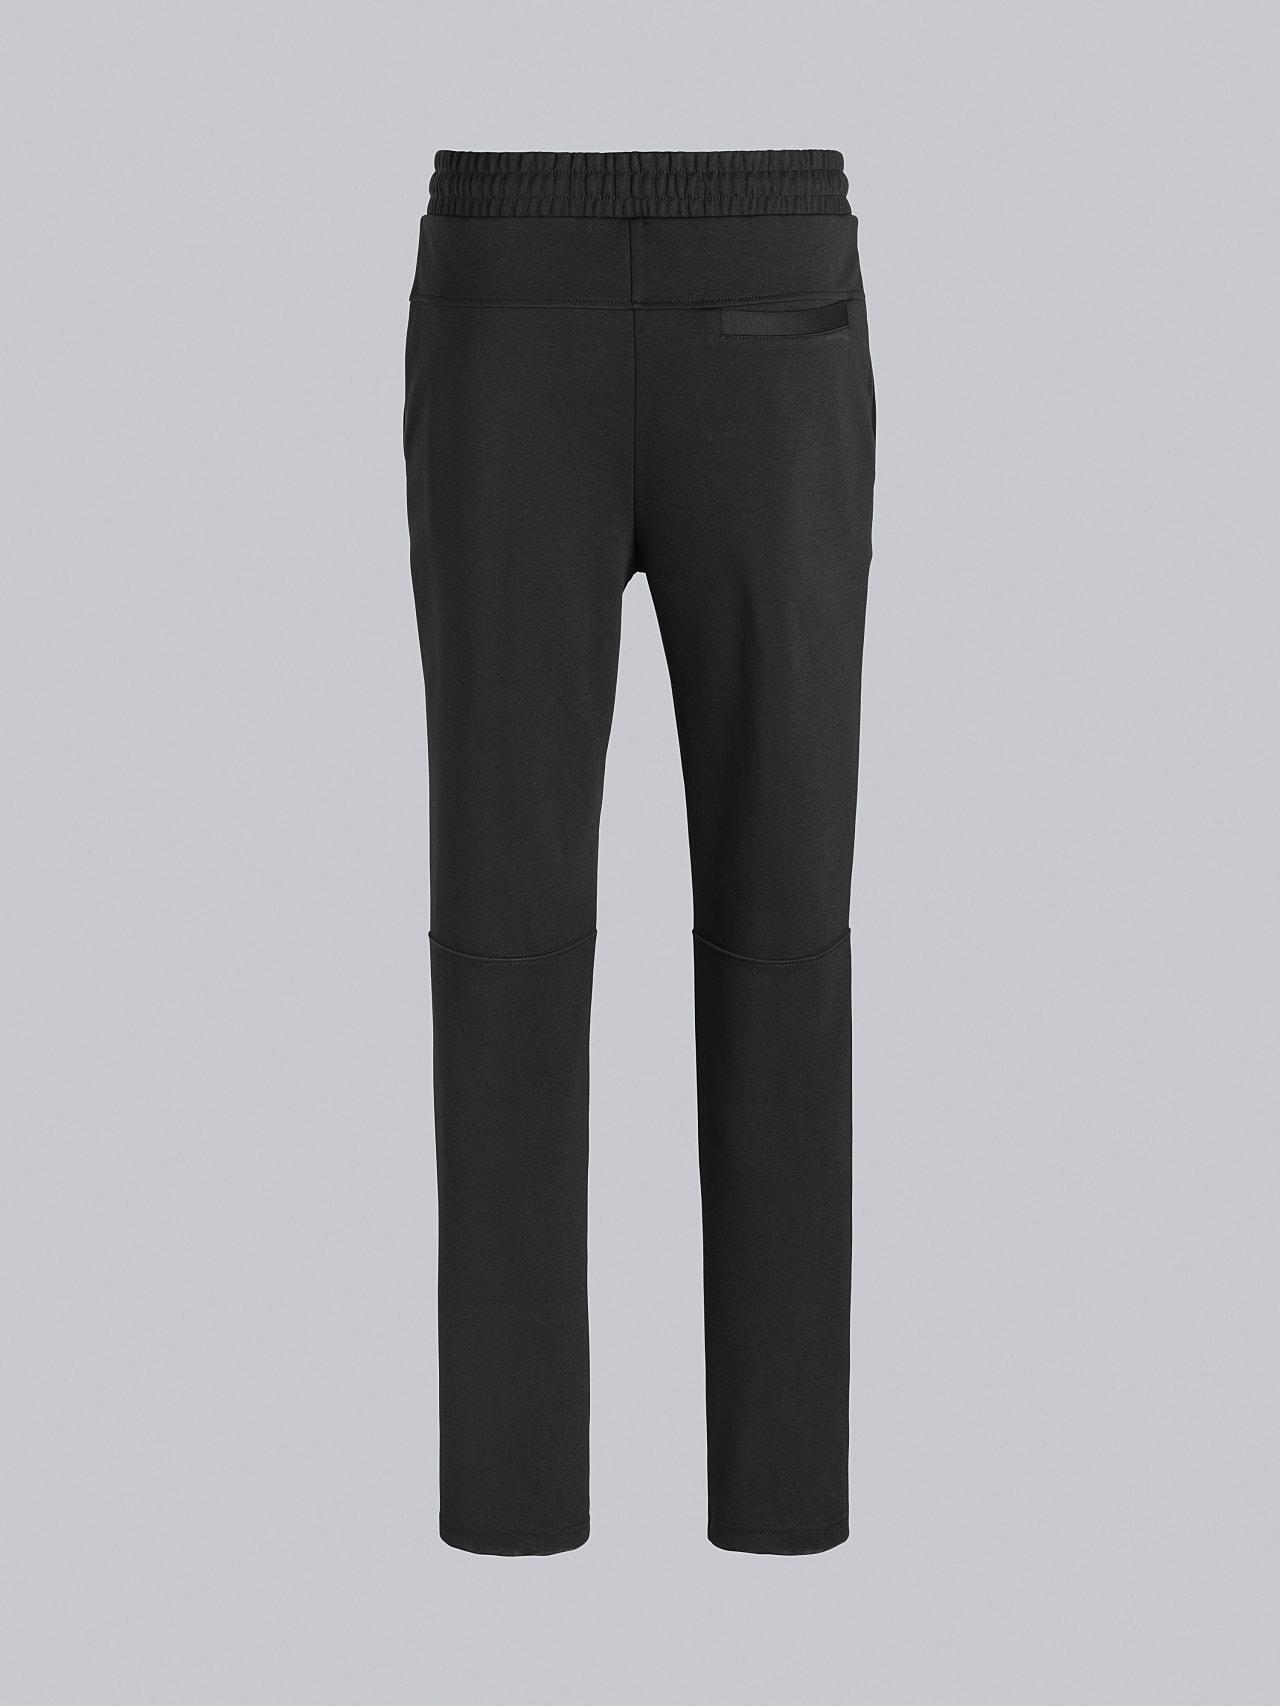 PRYK V7.Y5.02 Premium Sweatpants black Left Alpha Tauri